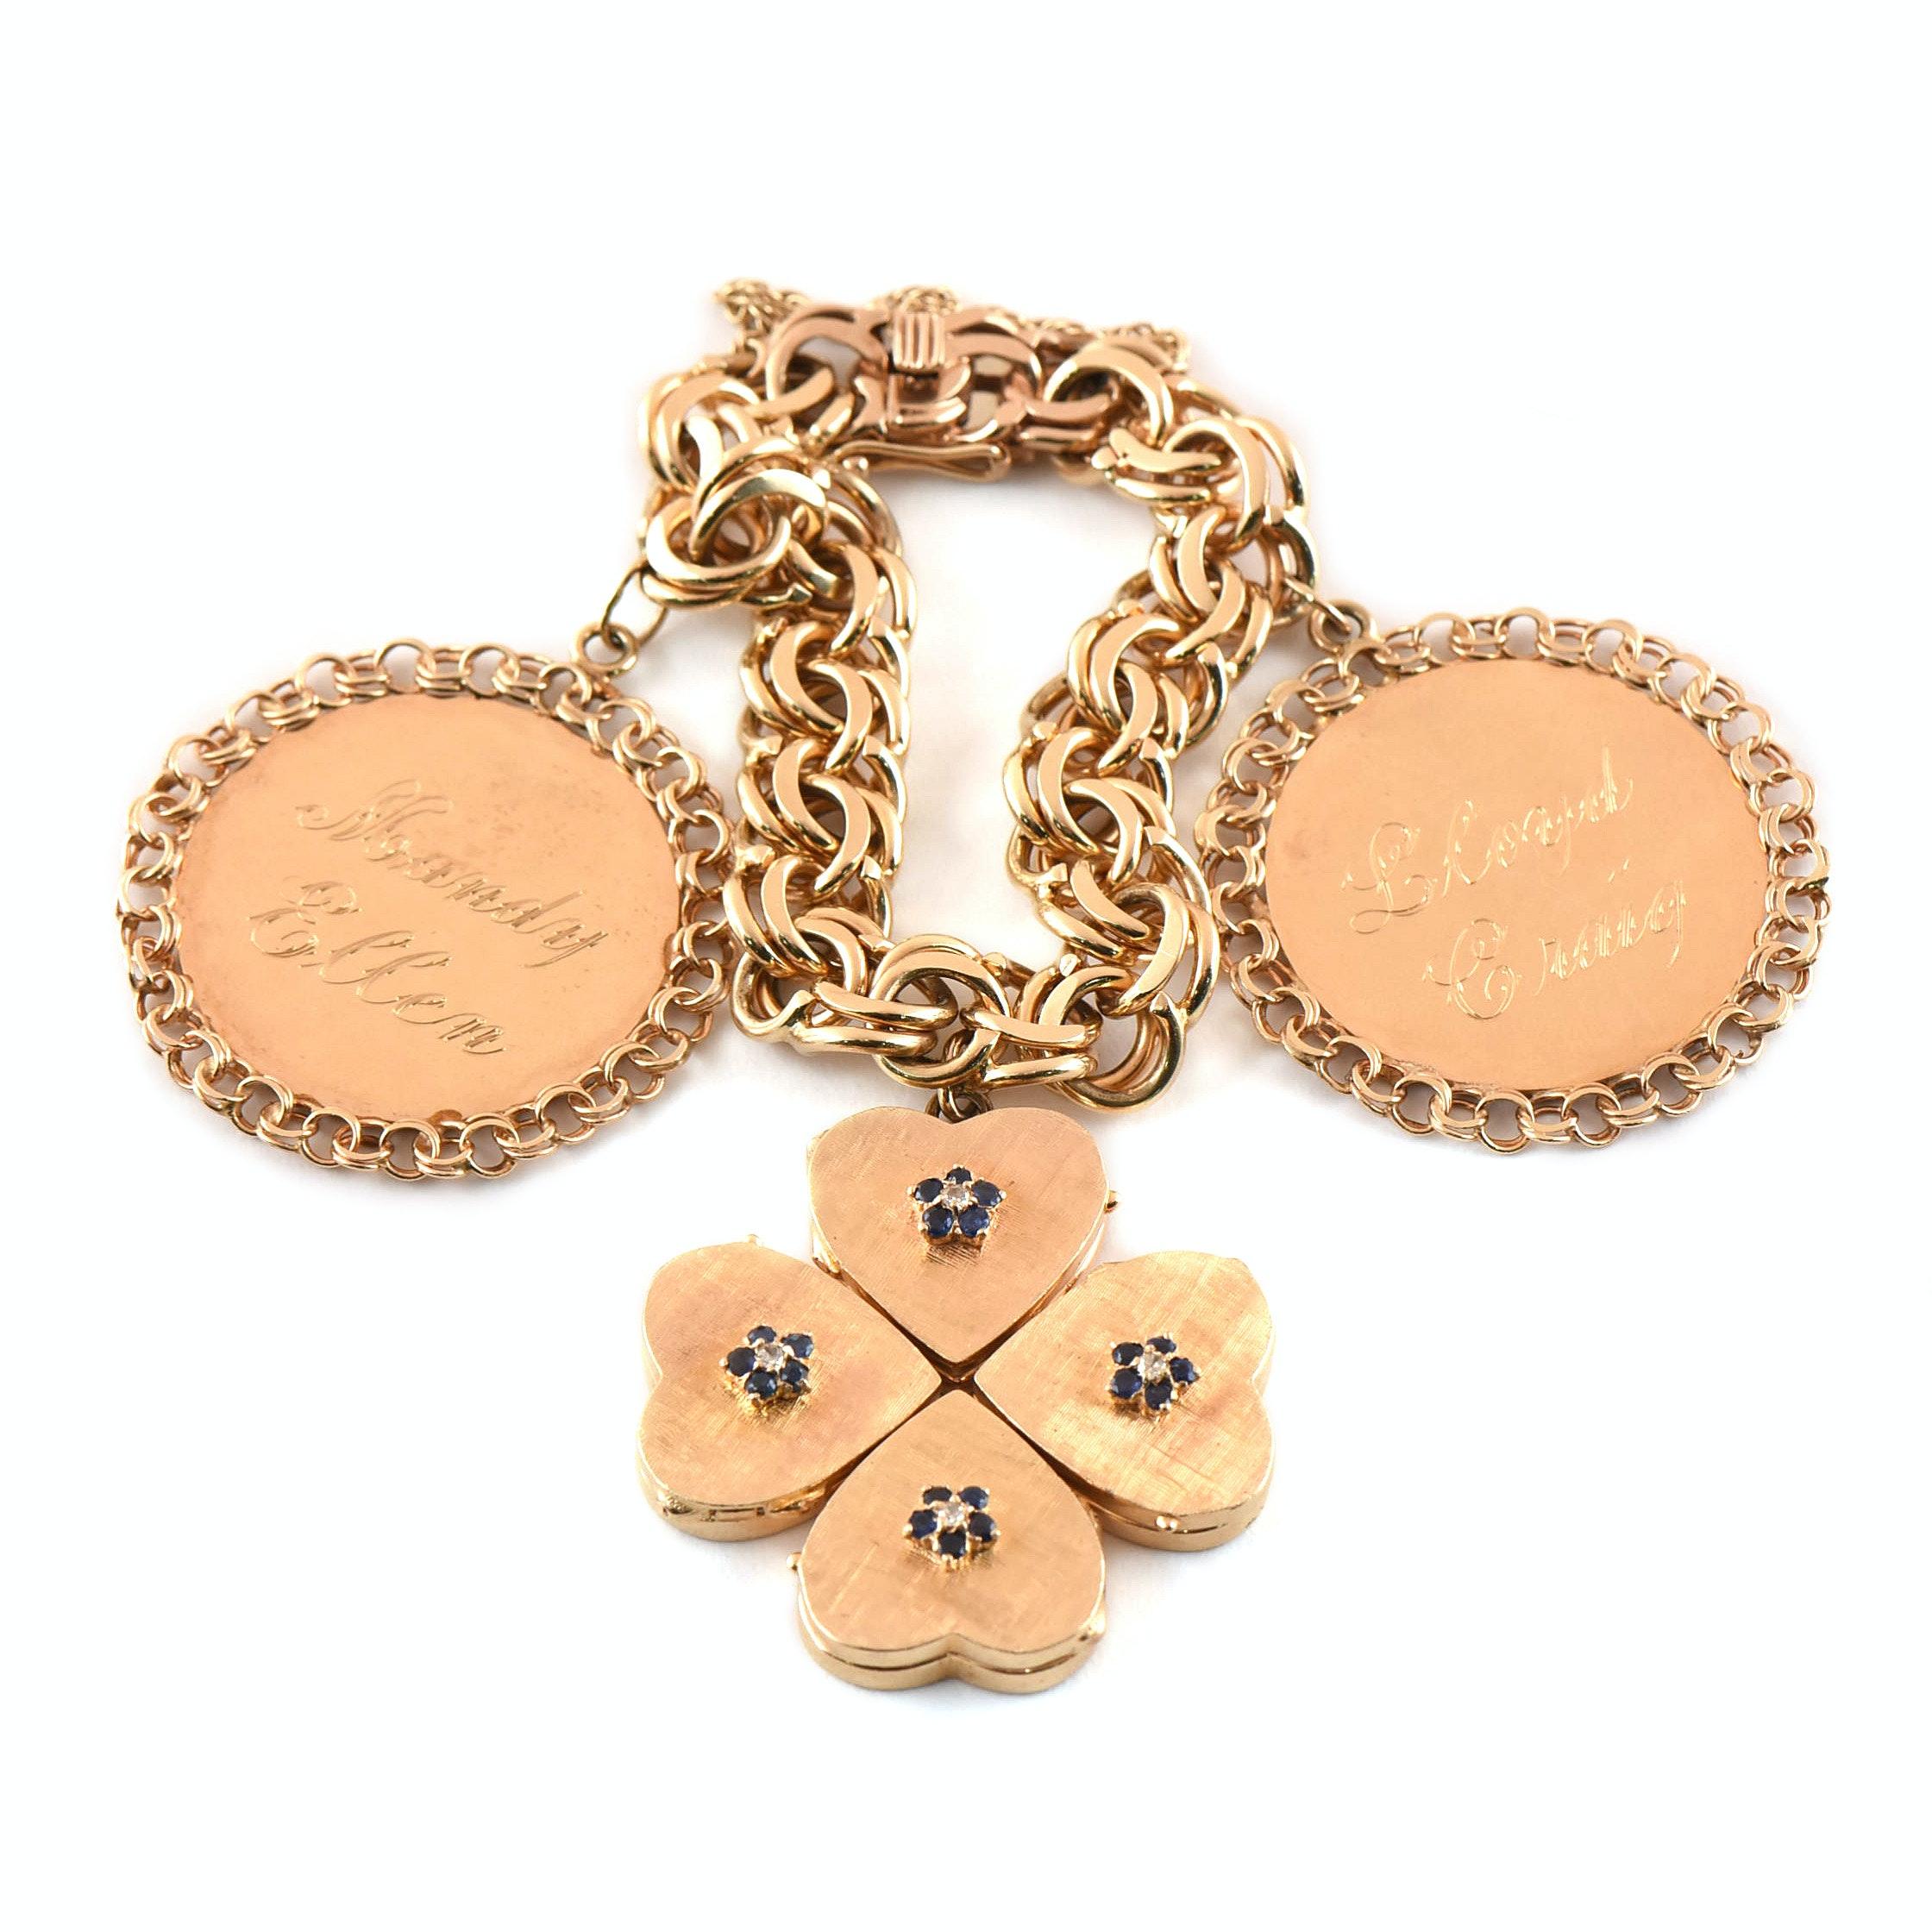 Vintage 14K Yellow Gold Bracelet with Sapphire and Diamond Shamrock Locket Charm